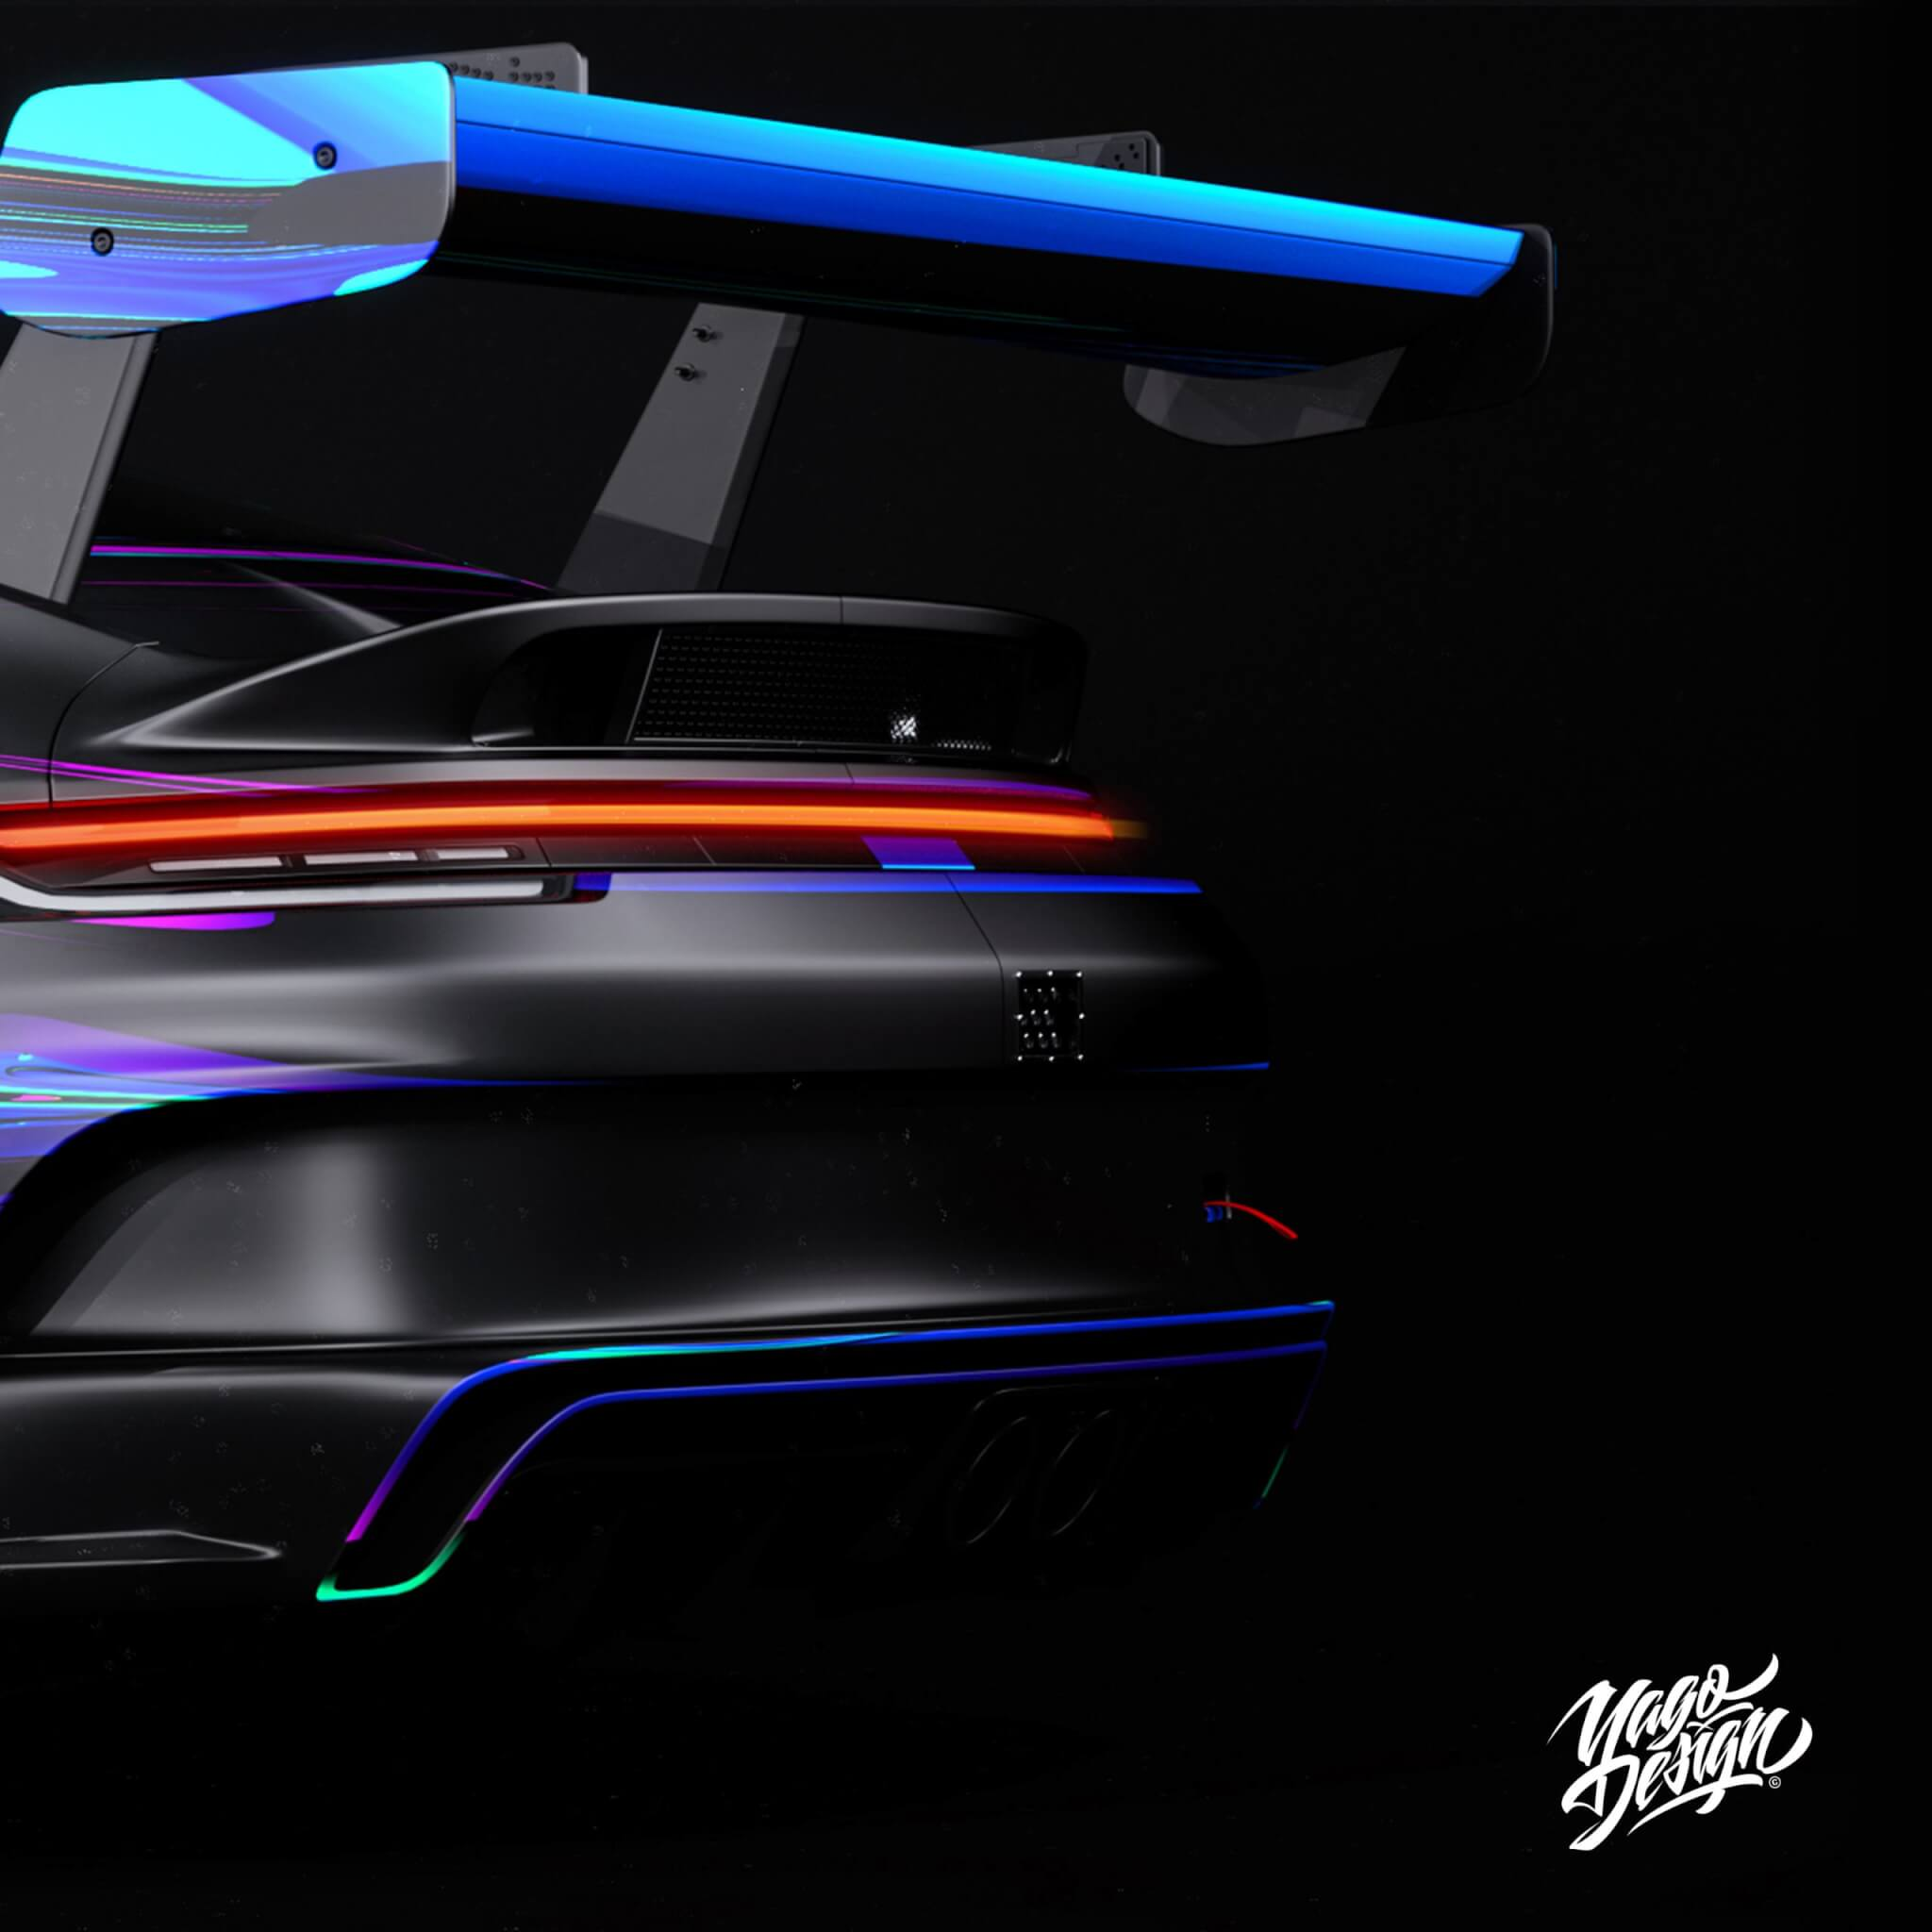 Porsche-911-gt3-rs-Yagodesign-5